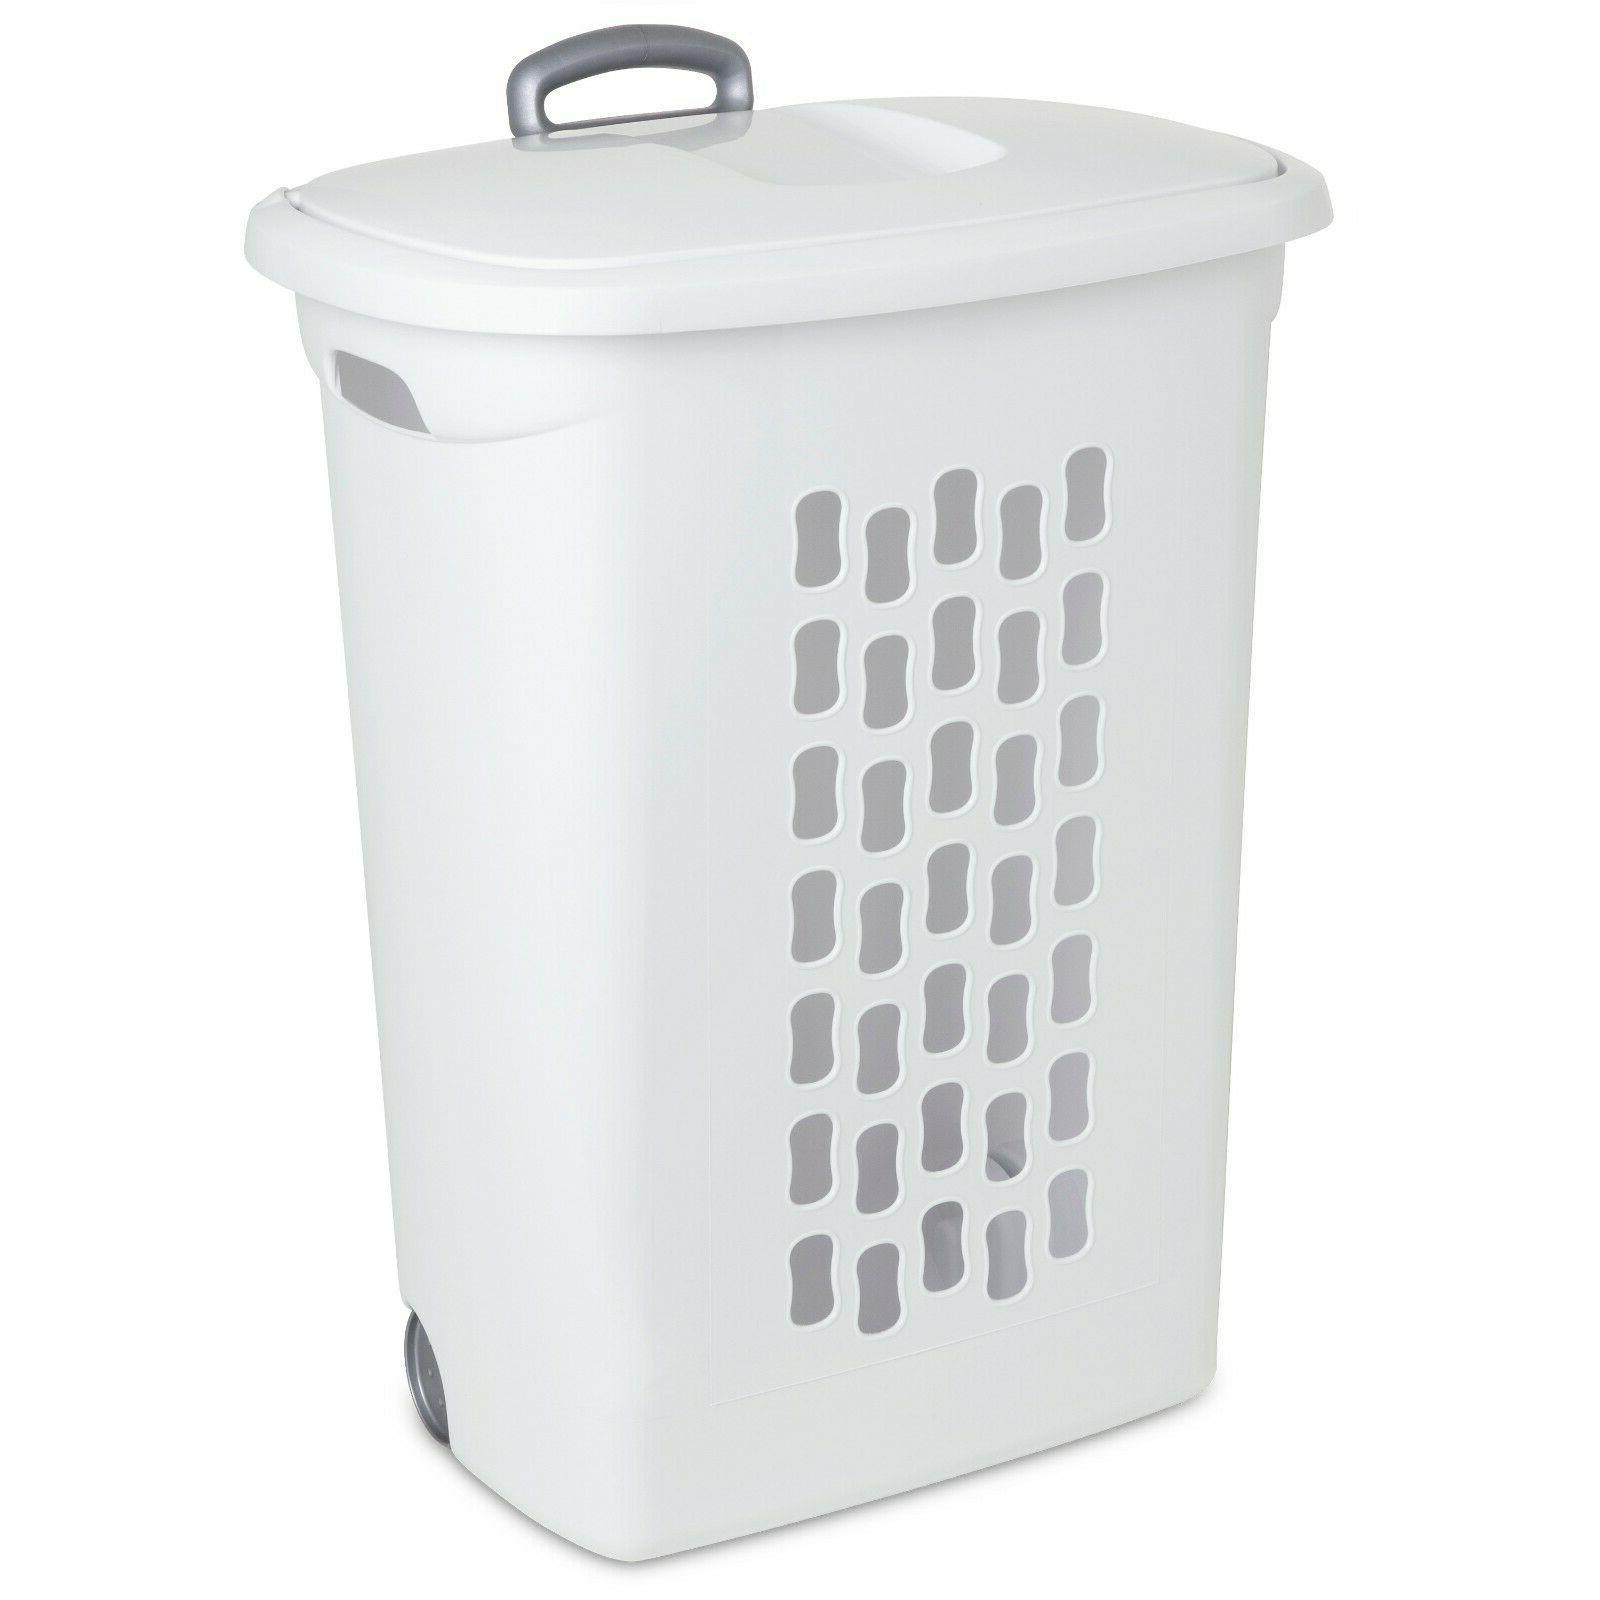 3 PACK Laundry Hamper Basket Clothes Storage Lid White